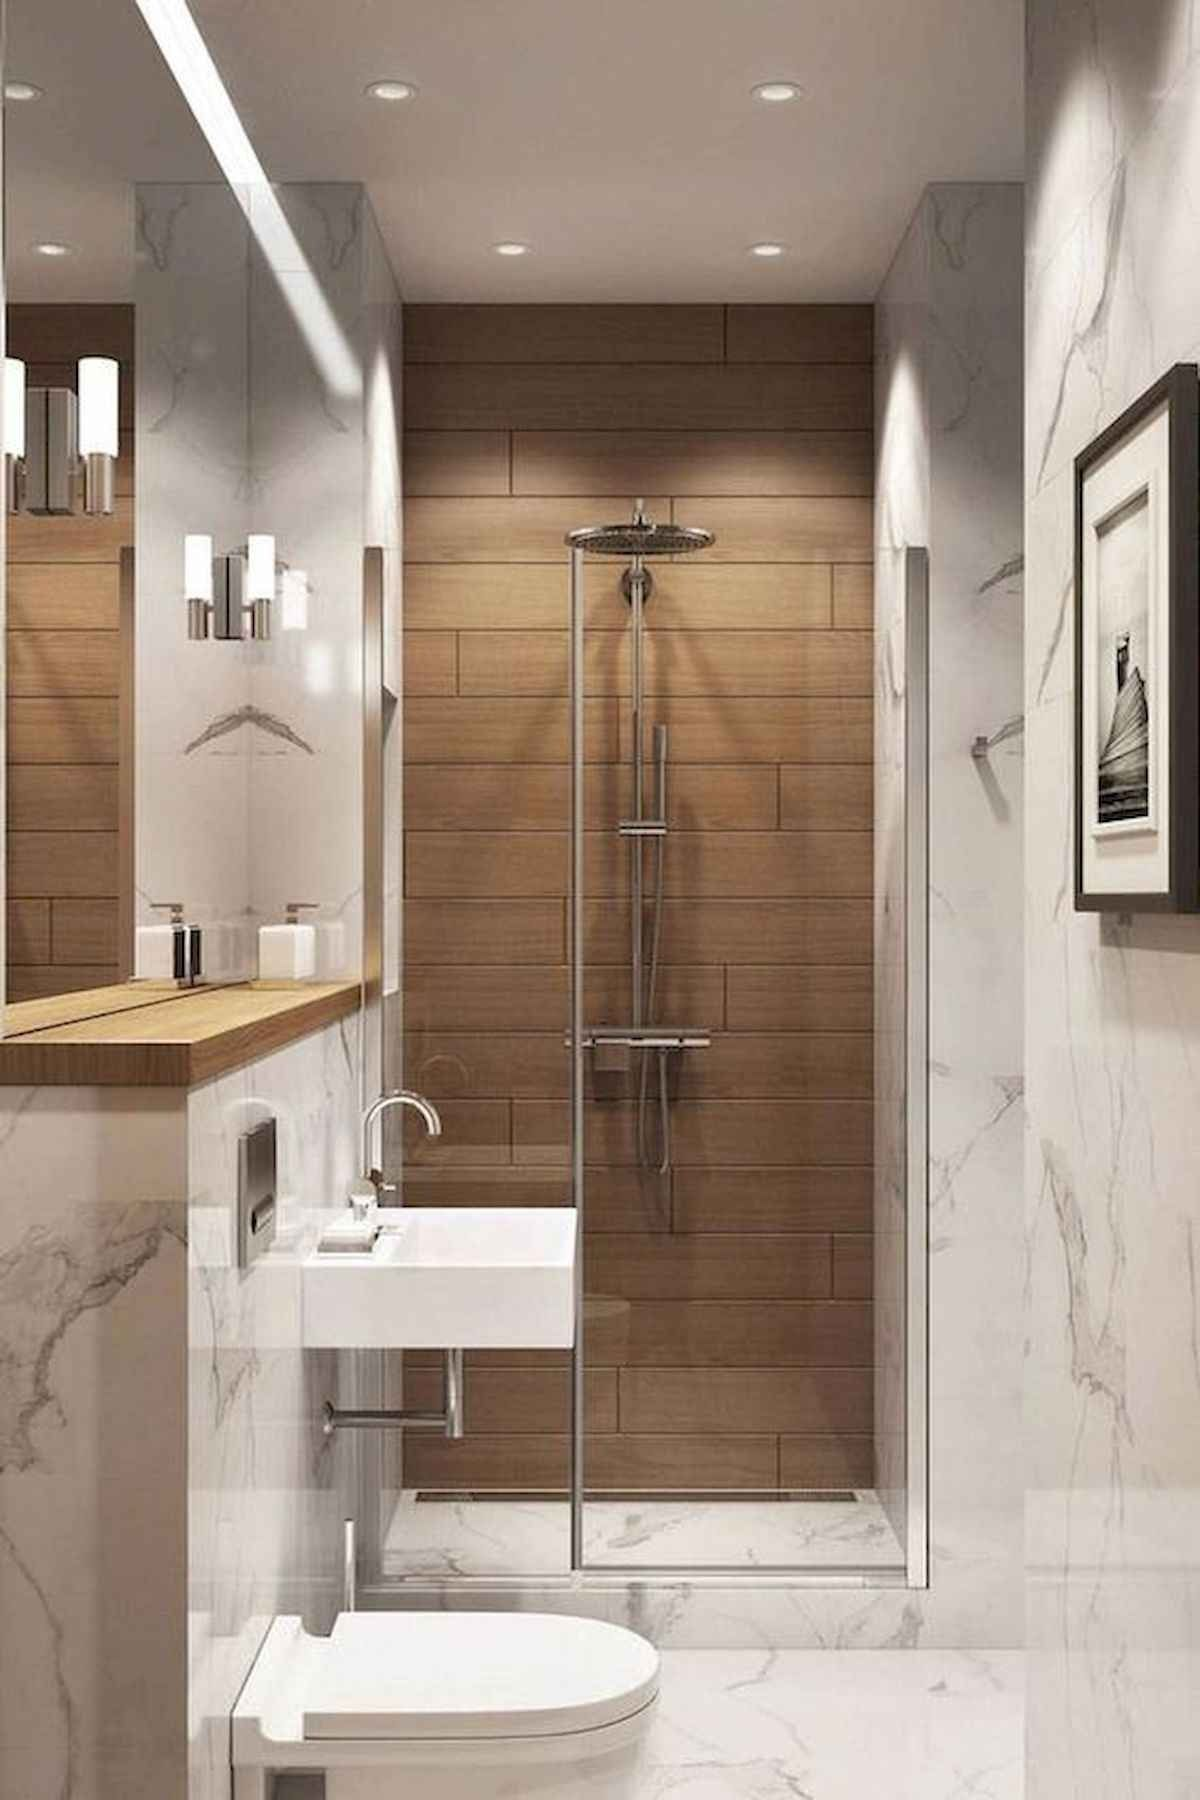 50 Stunning Small Bathroom Makeover Ideas Small Bathroom Remodel Small Bathroom Makeover Bathroom Interior Design